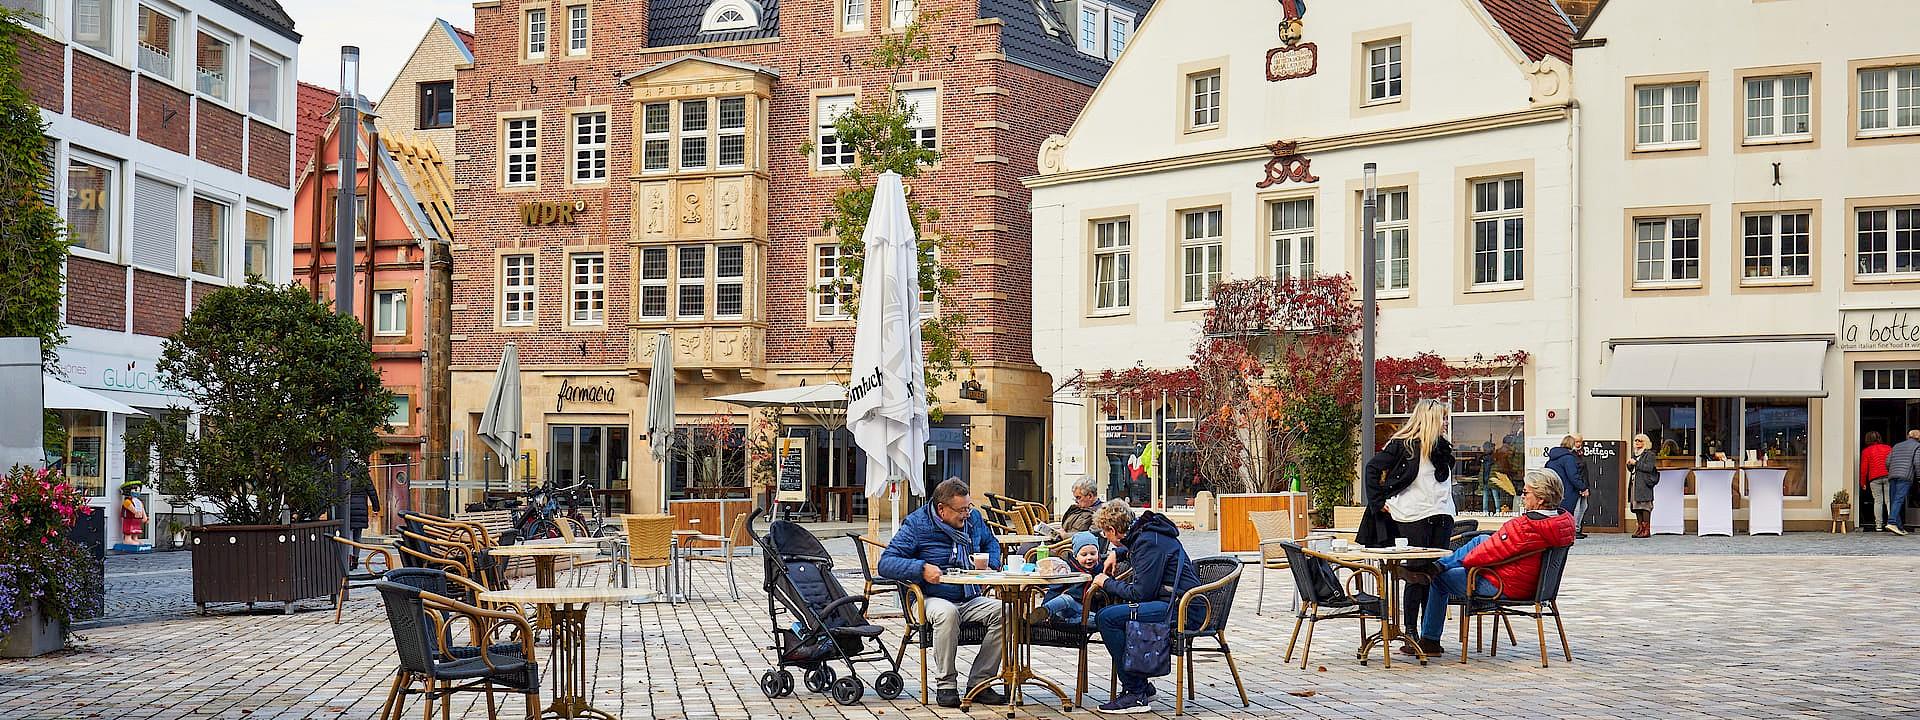 Stadt mit Dreiklang Rheine